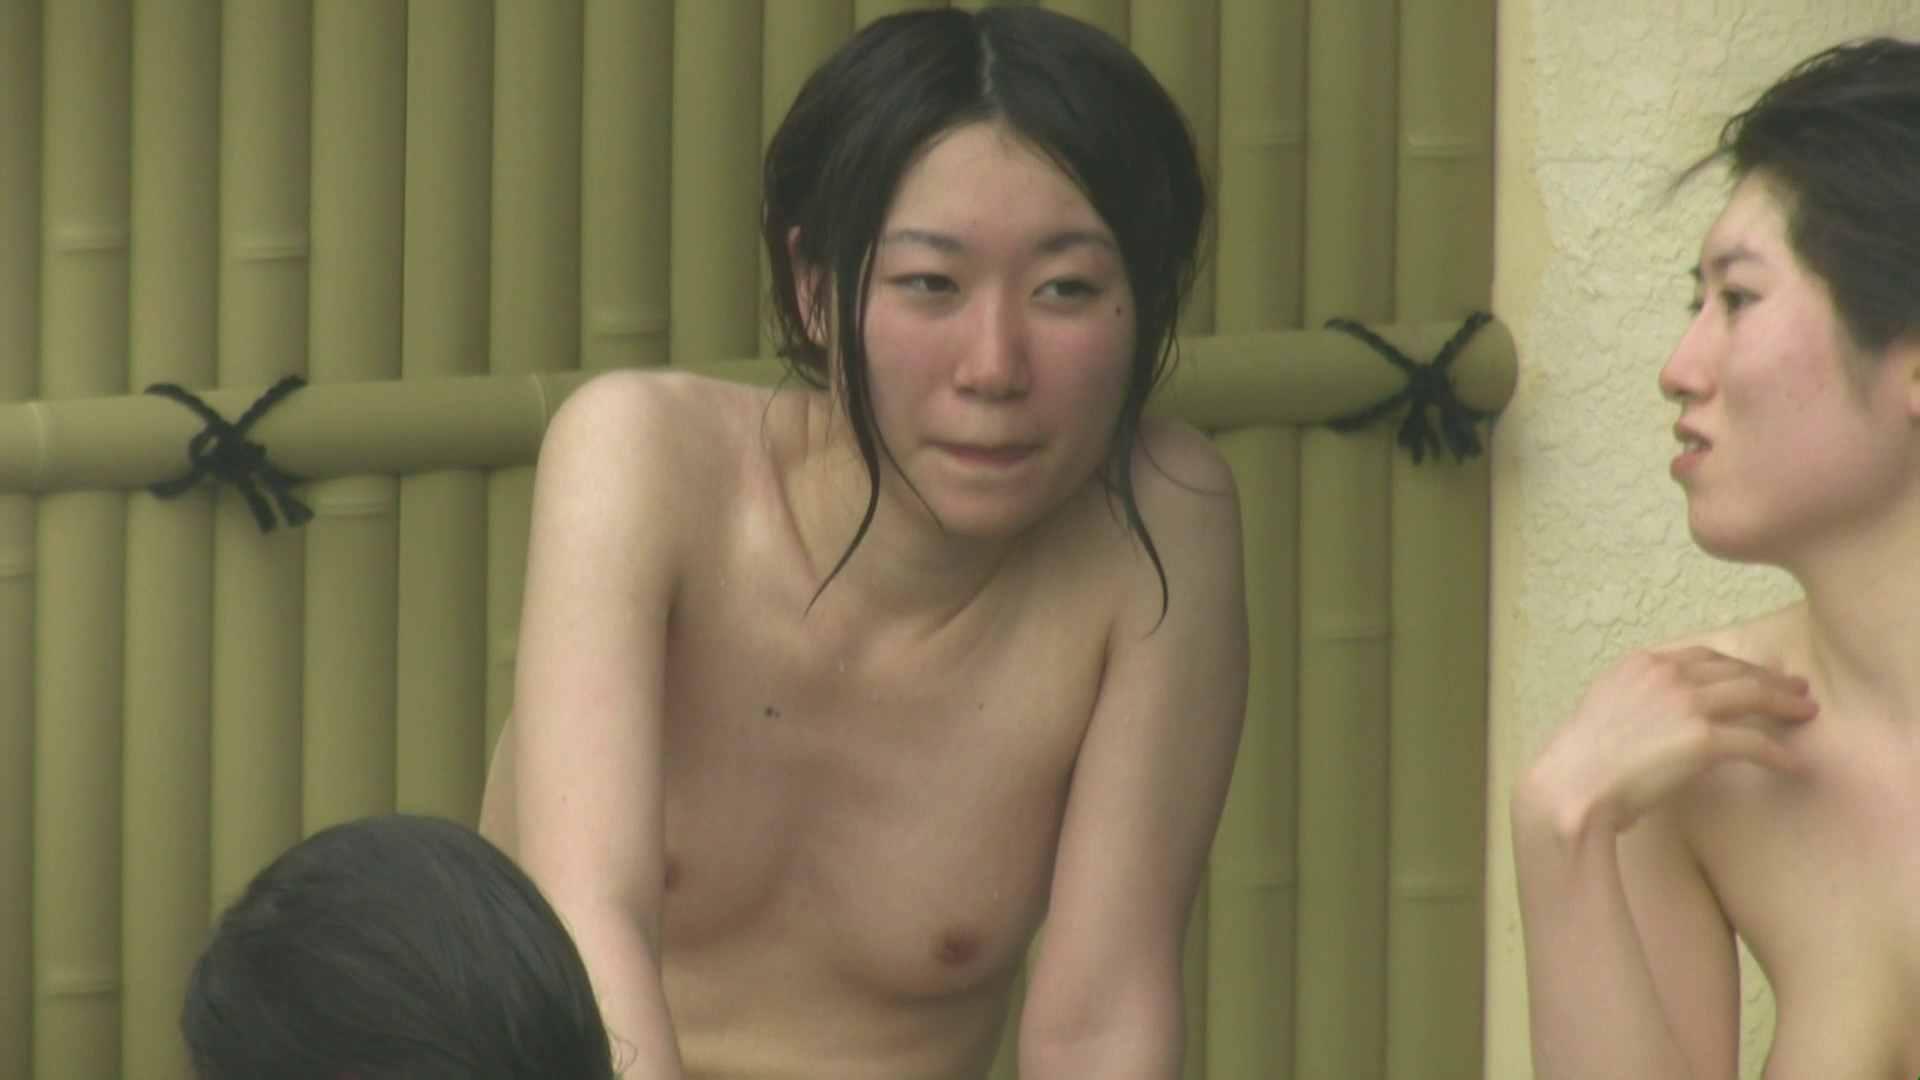 高画質露天女風呂観察 vol.025 ギャル入浴  81連発 42